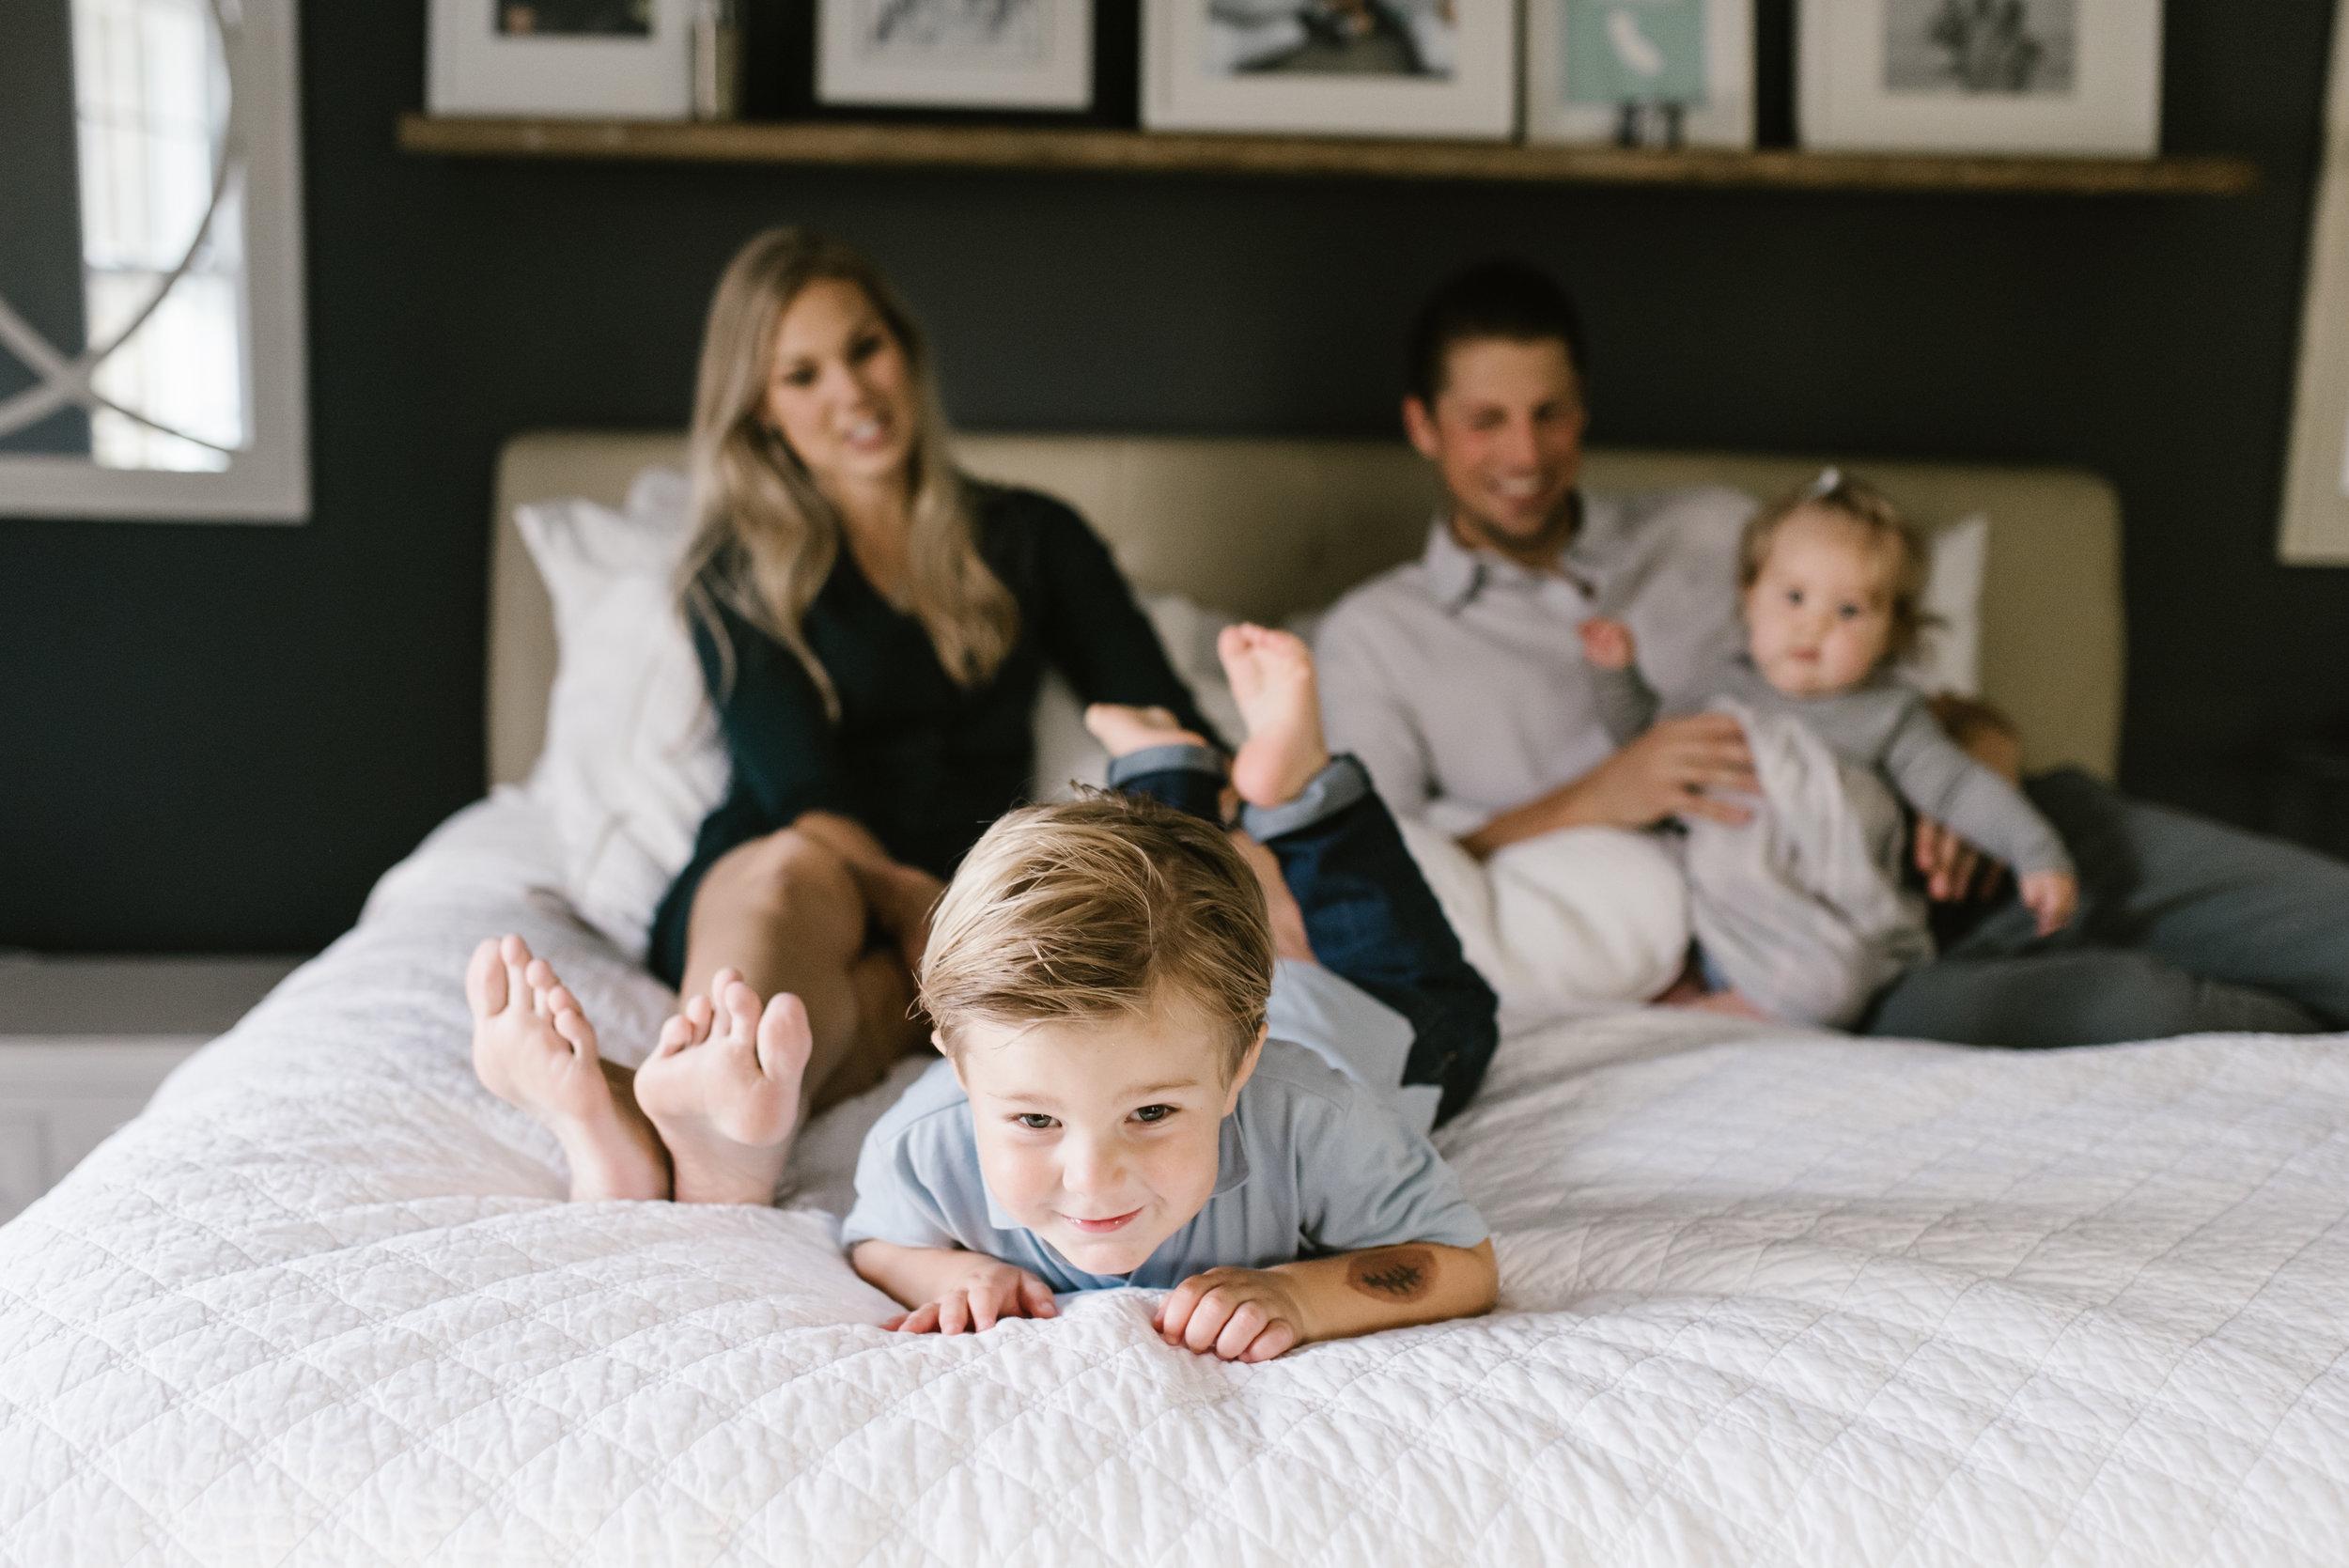 baltimorelifestylefamilyportraitsession-4.jpg